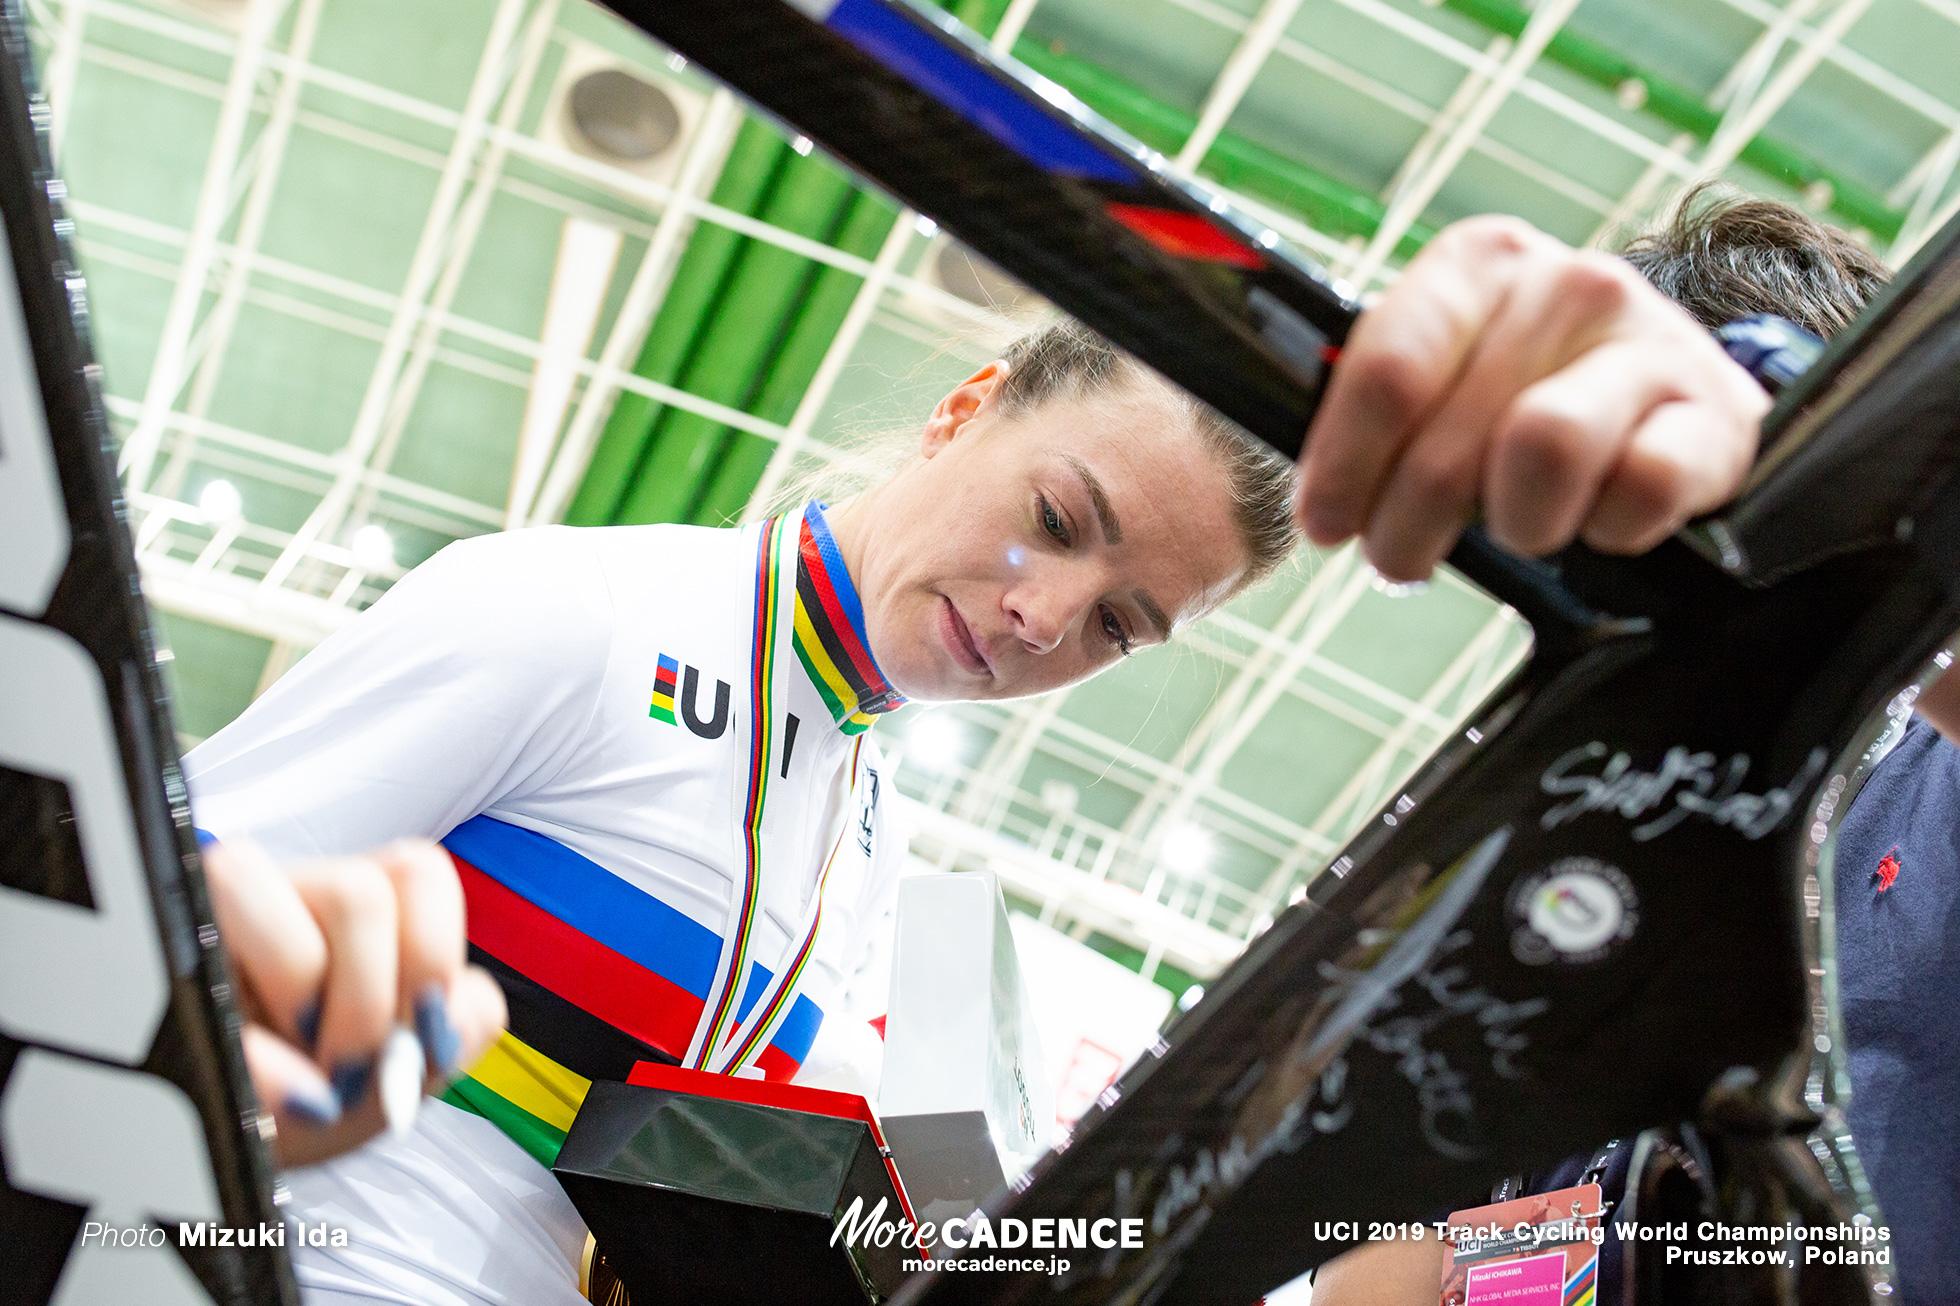 Annette Edmondson, Ashlee Ankudinoff, Georgia Baker, Amy Cure, Alexandra Manly / 2019 Track Cycling World Championships Pruszków, Poland